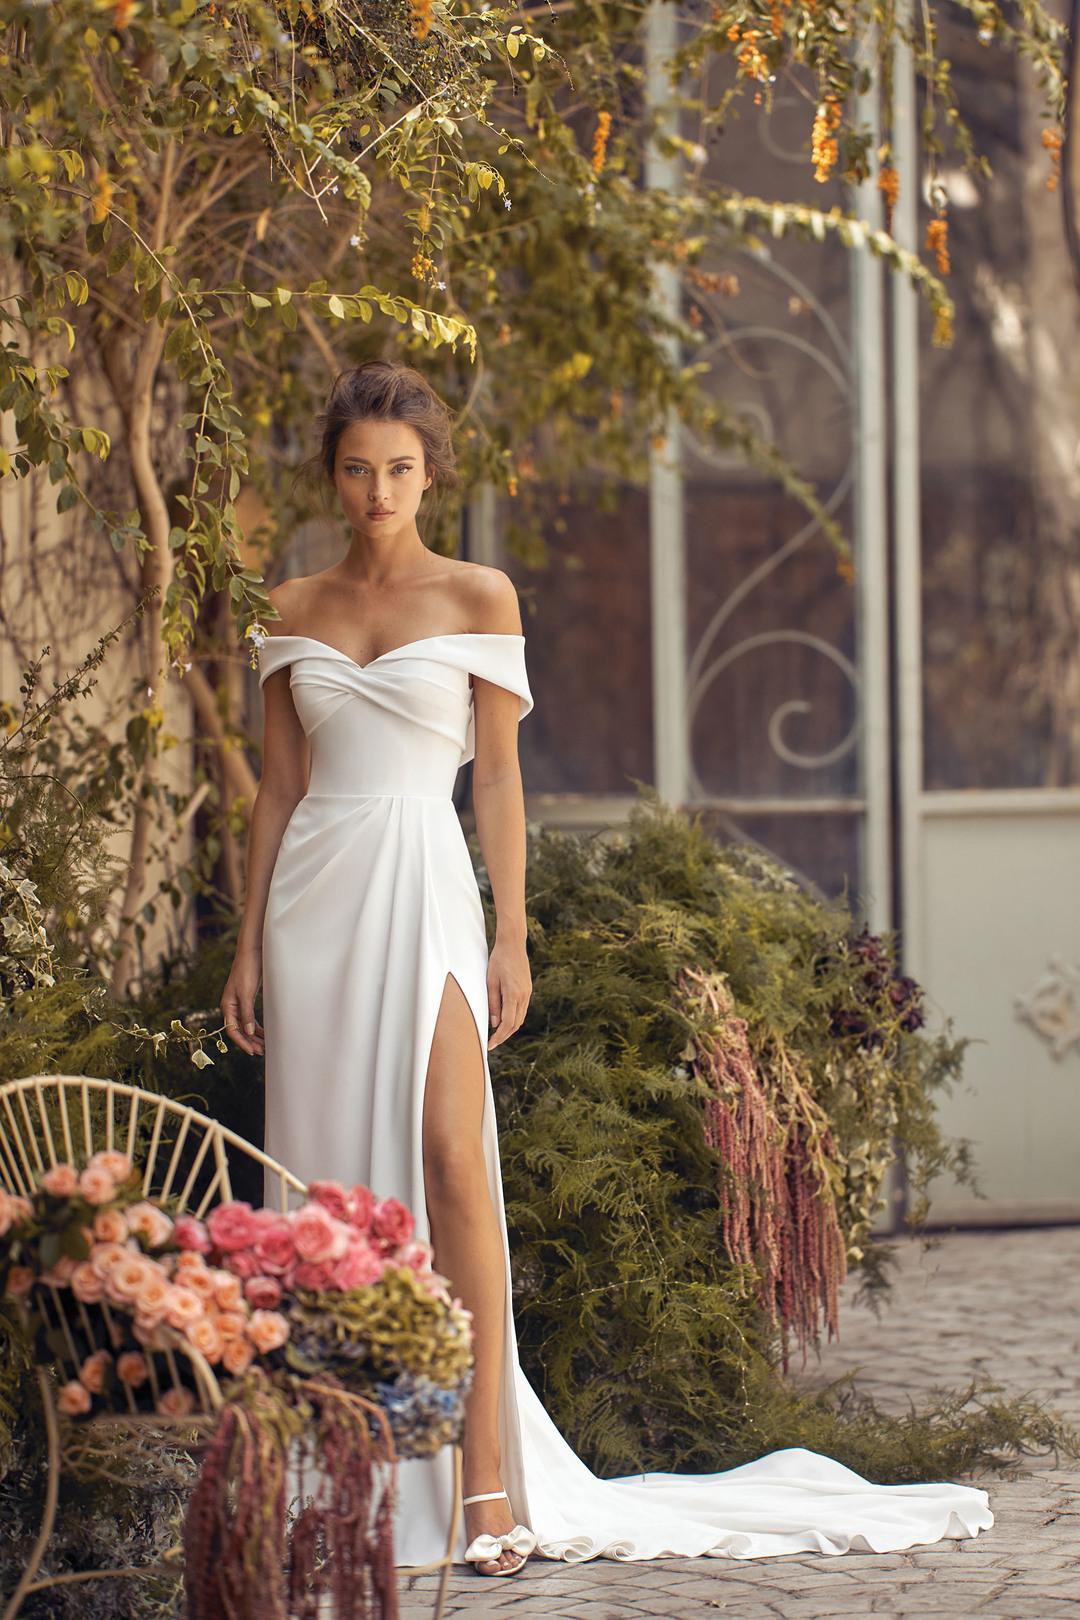 asia dress photo